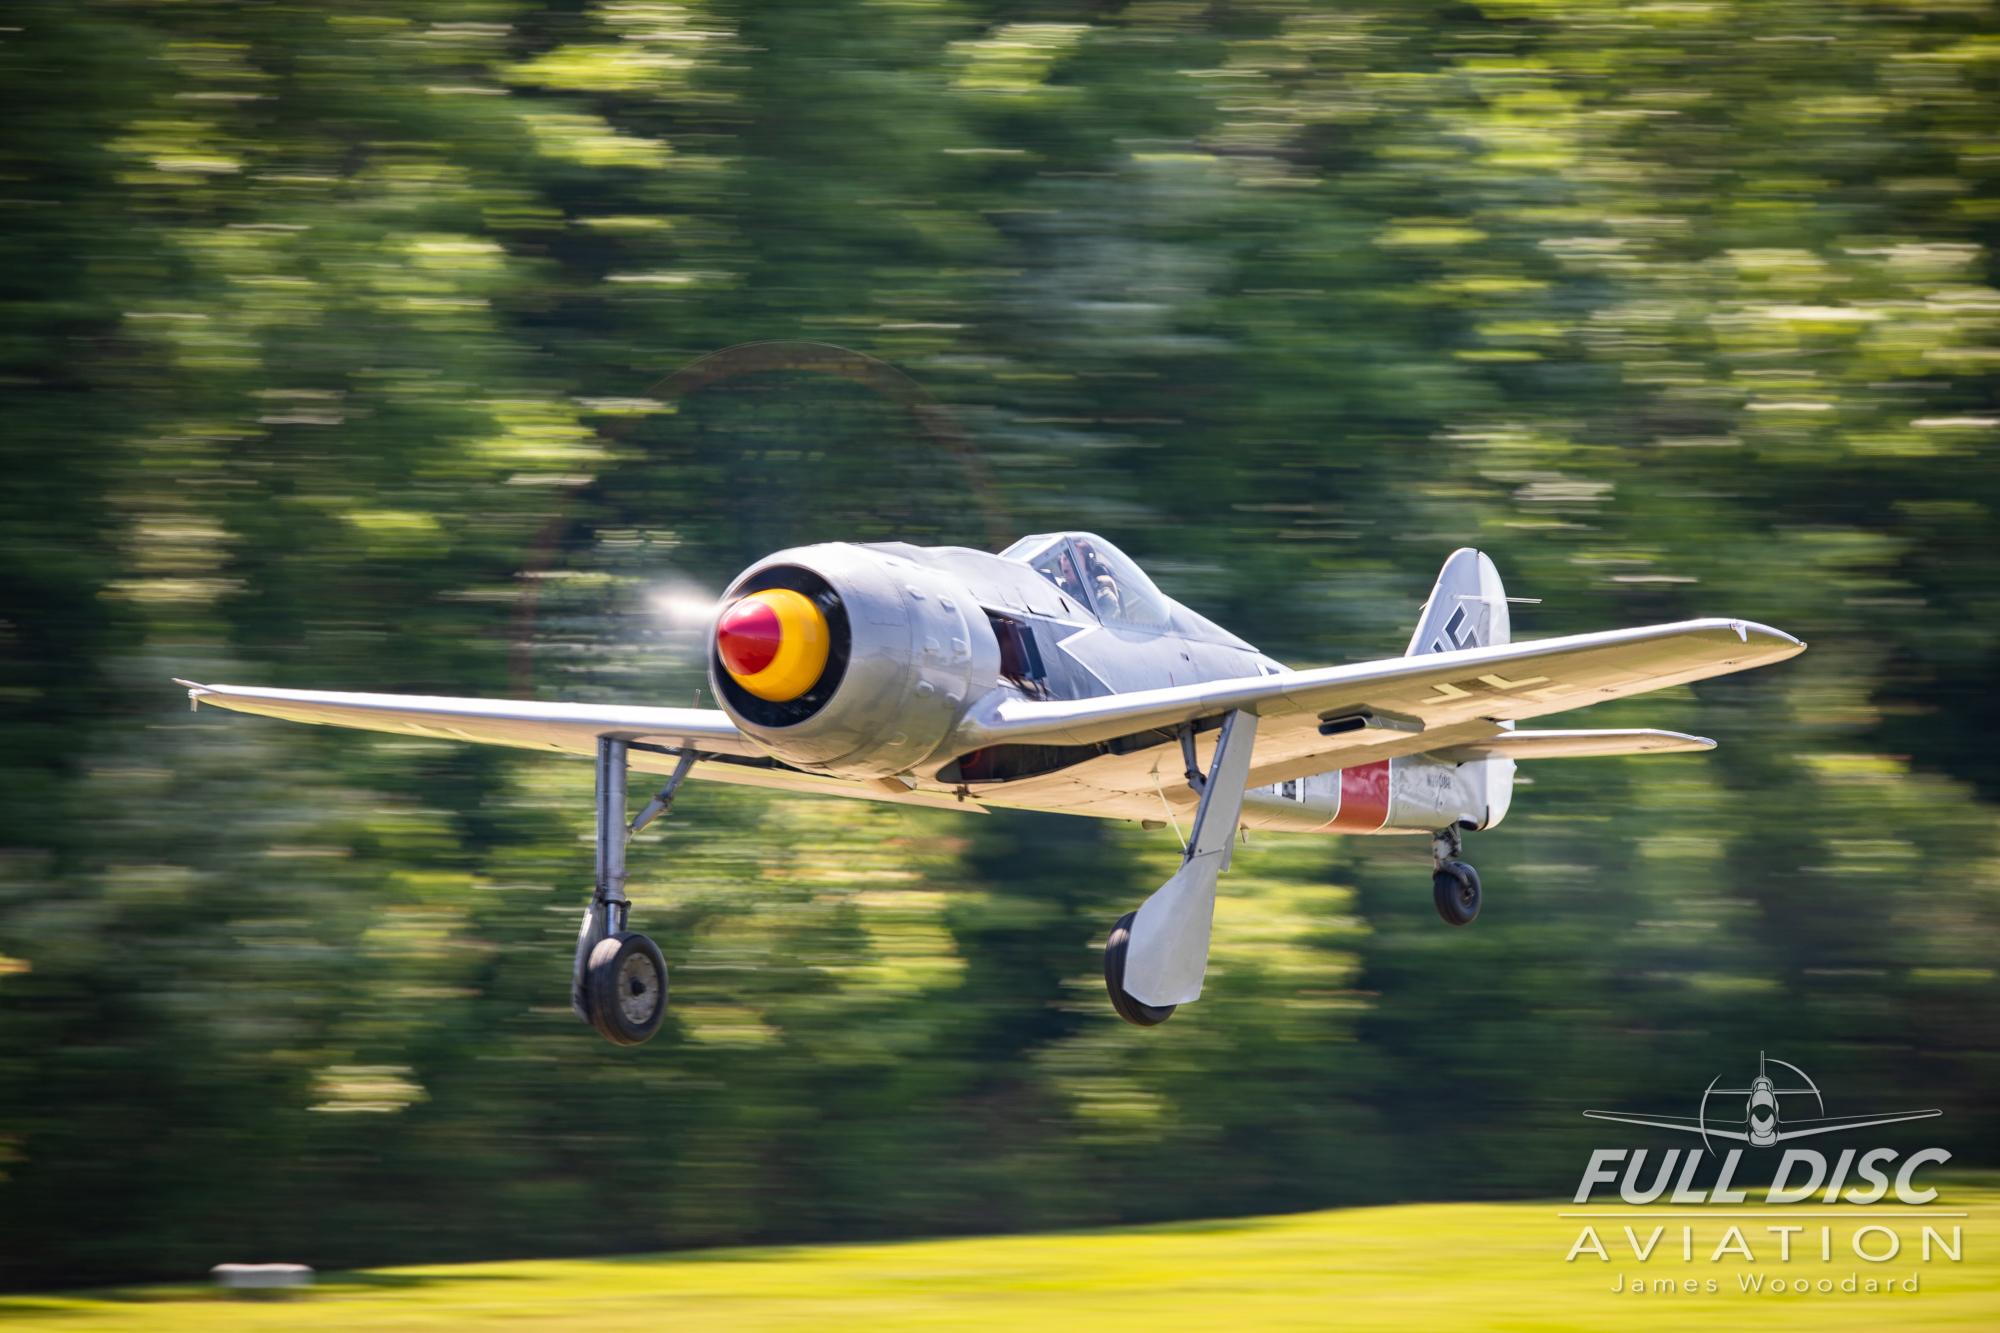 WarbirdsOverTheBeach_FullDiscAviation_JamesWoodard-May 18, 2019-17.jpg